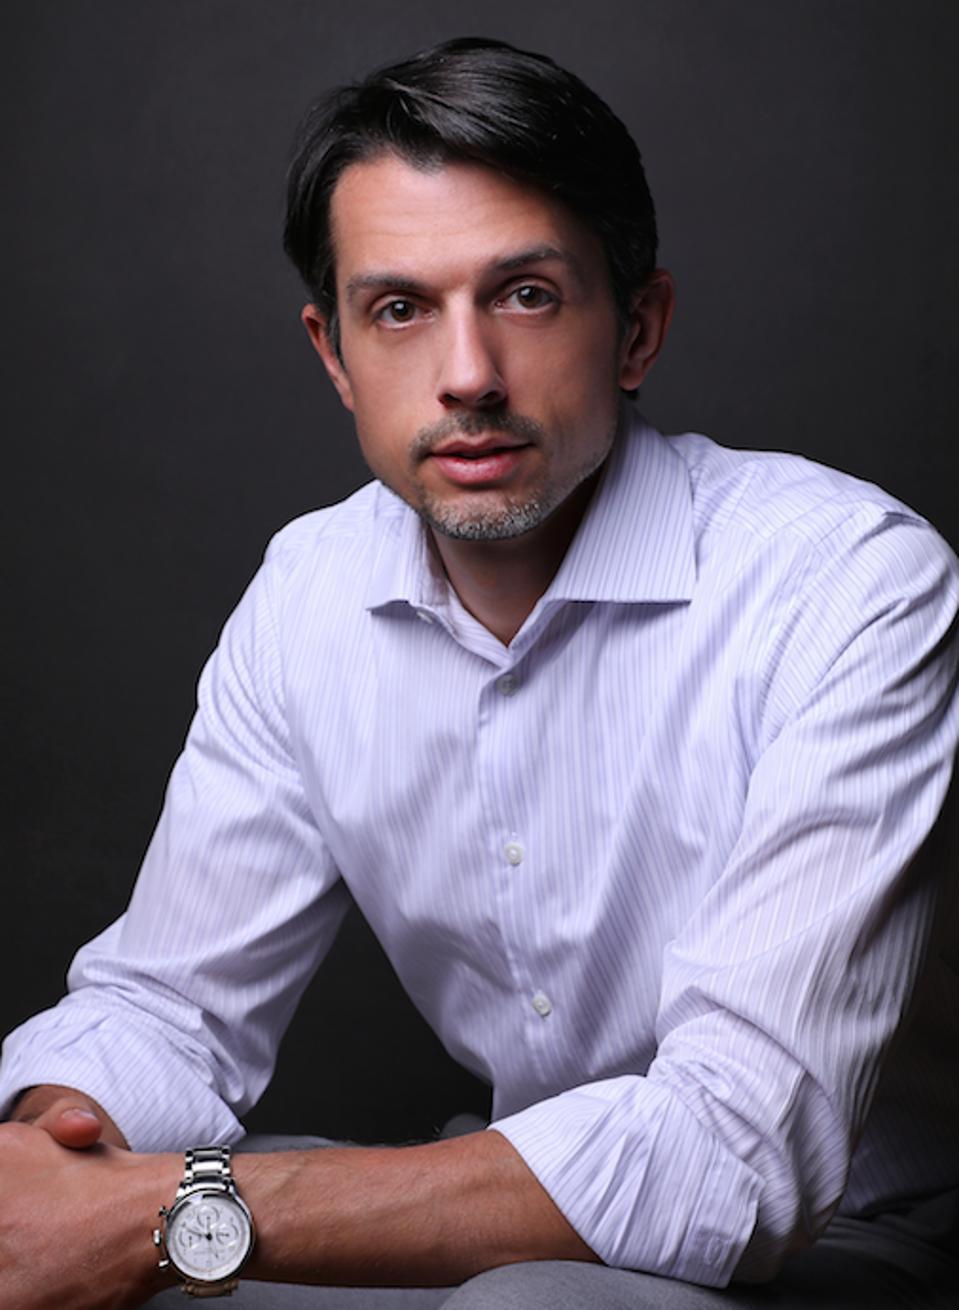 Partner of HBA EMEA, architect David T'Kint